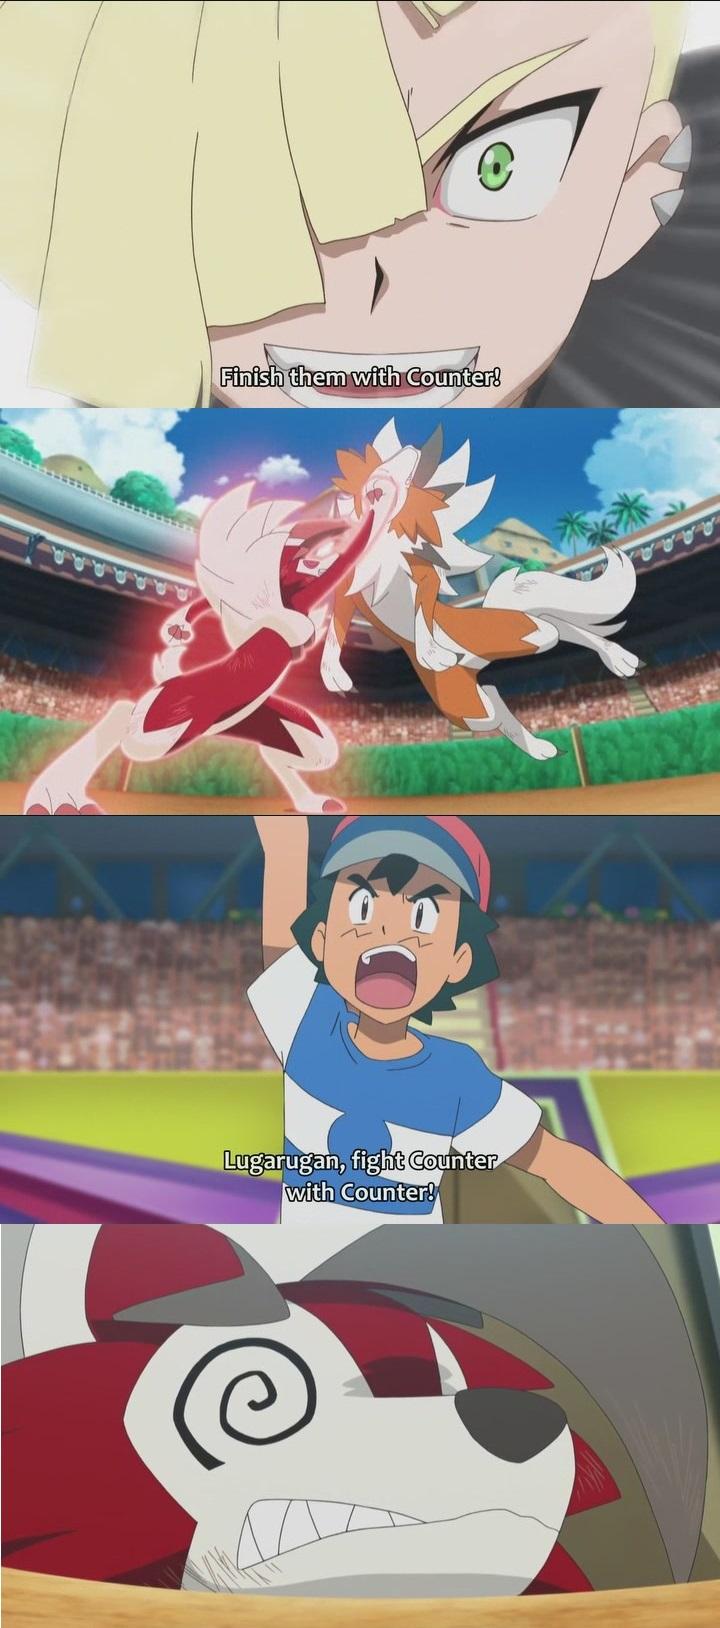 watch_pokemon_sun_moon_episode_139_english_subbedat_gogoan_0001.jpg